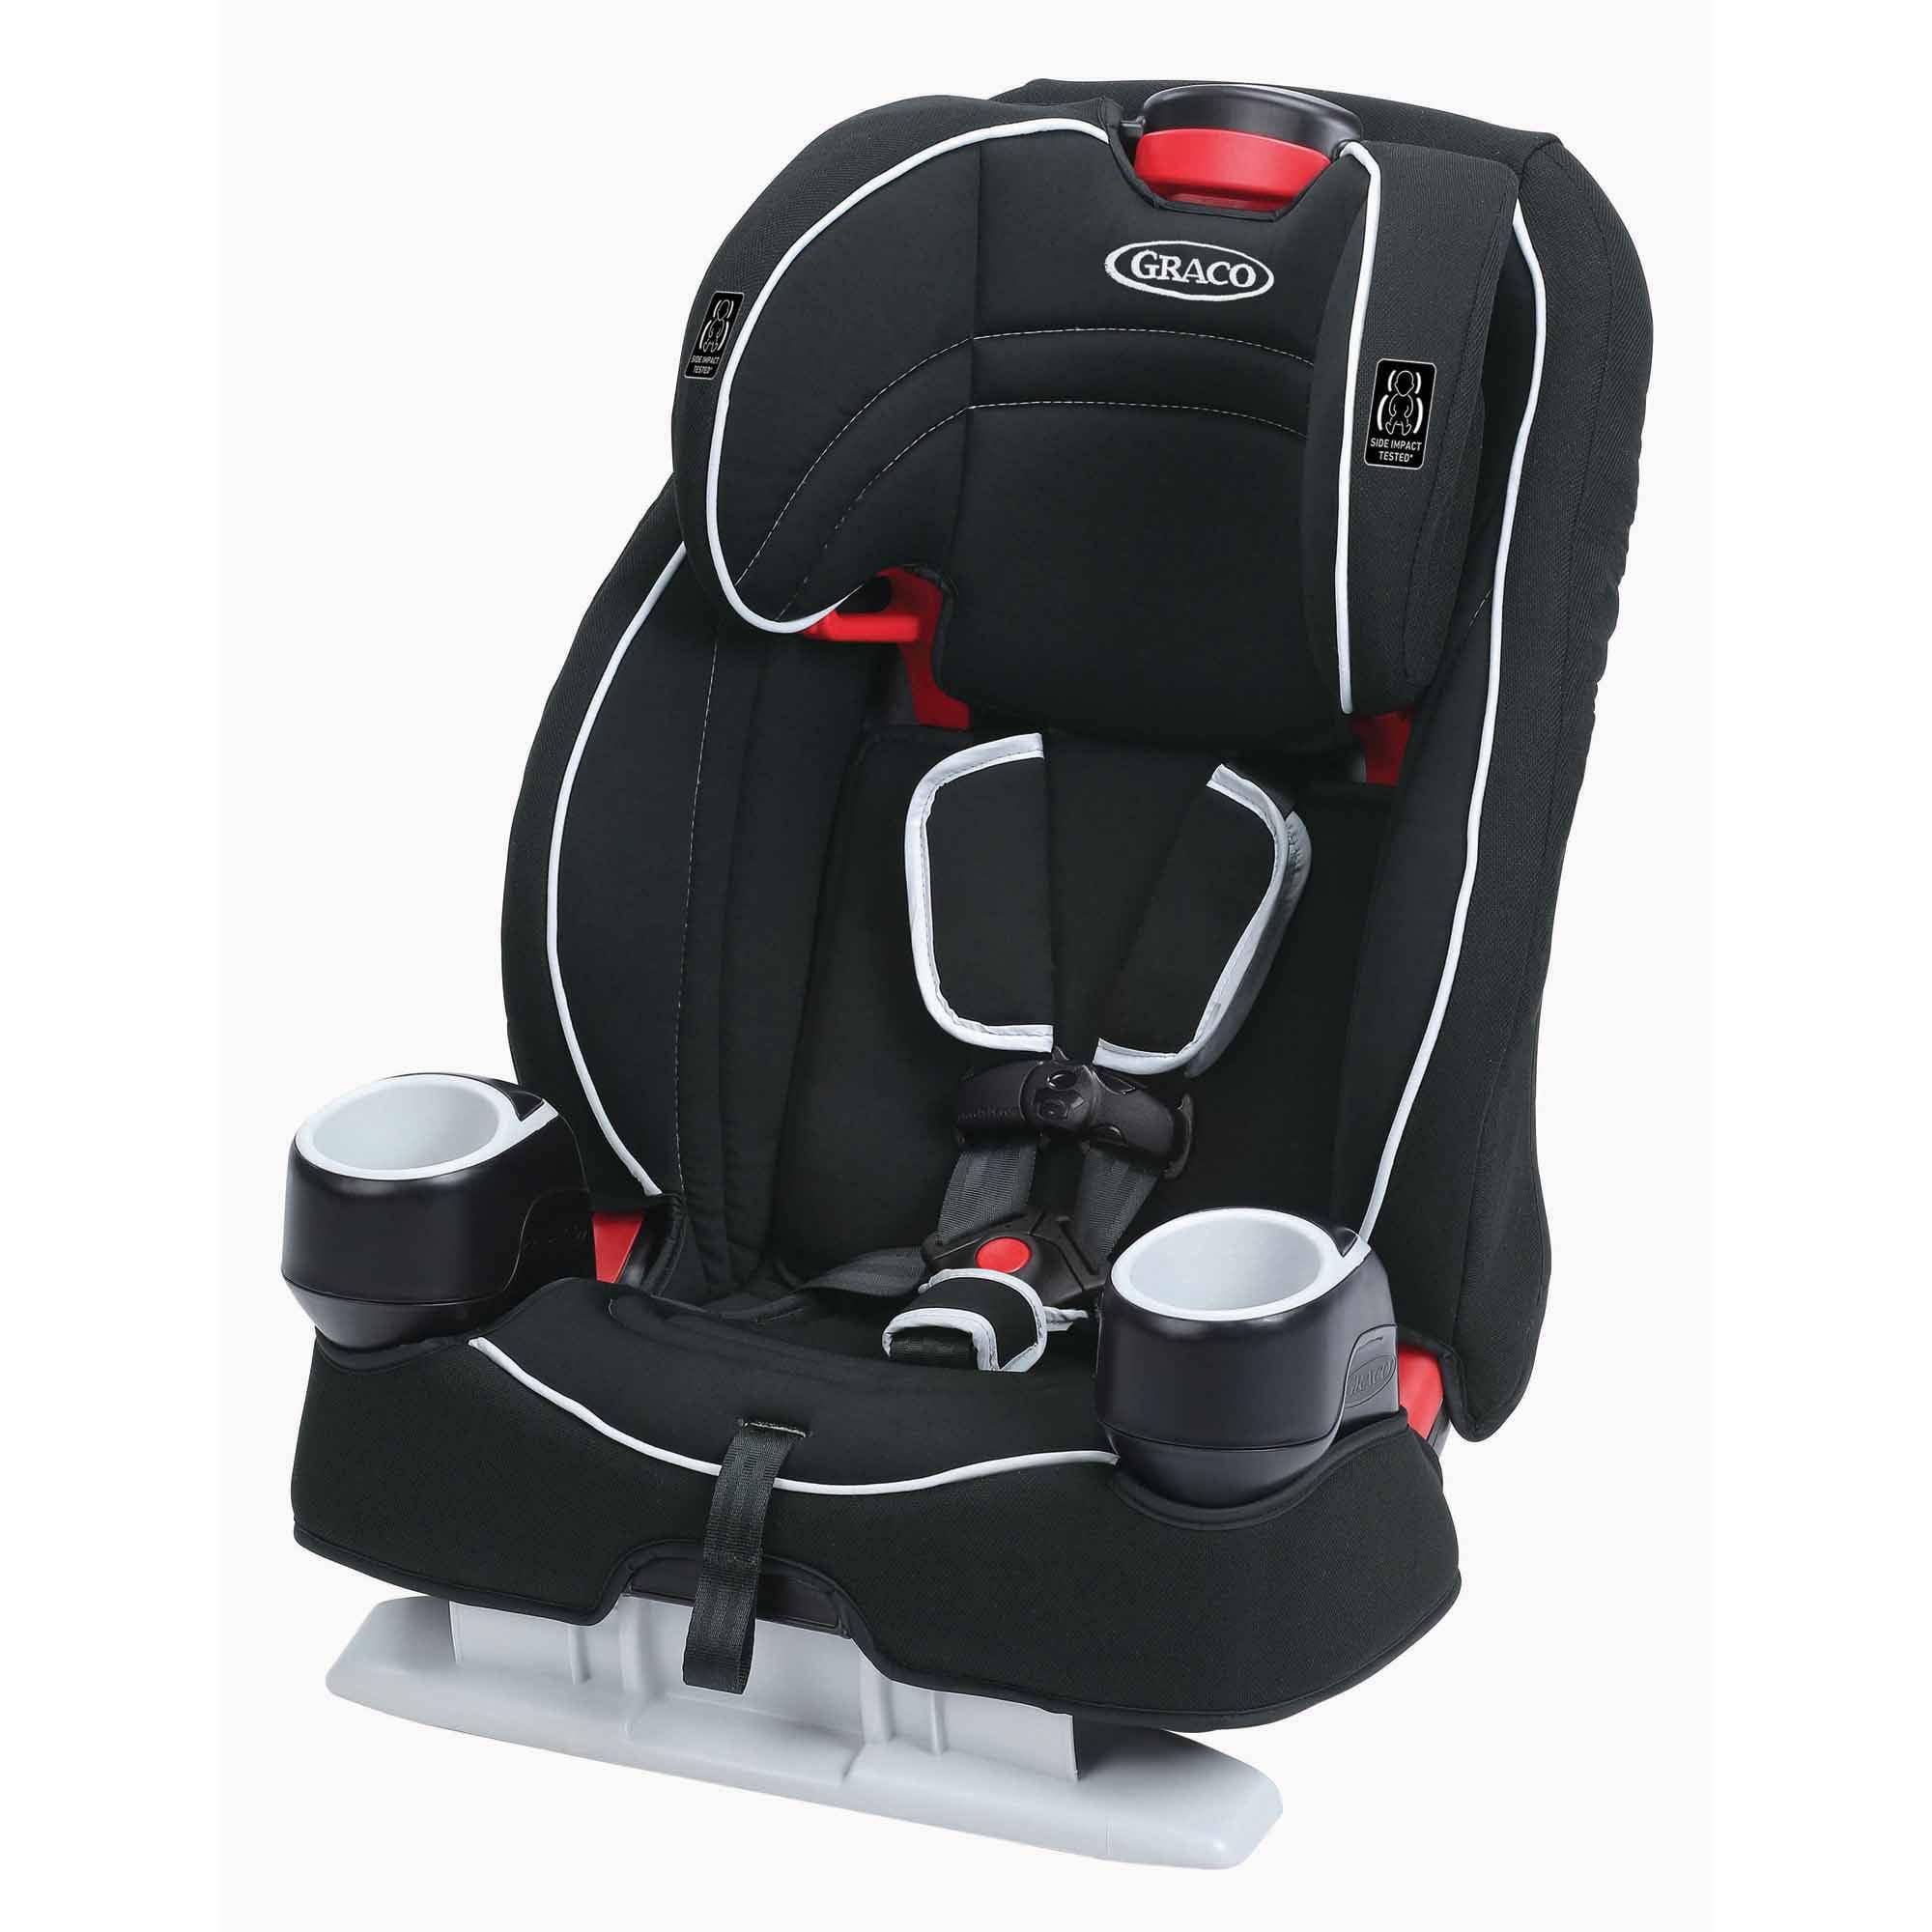 Graco Atlas 65 2-in-1 Harness Booster Car Seat, Glacier by Graco